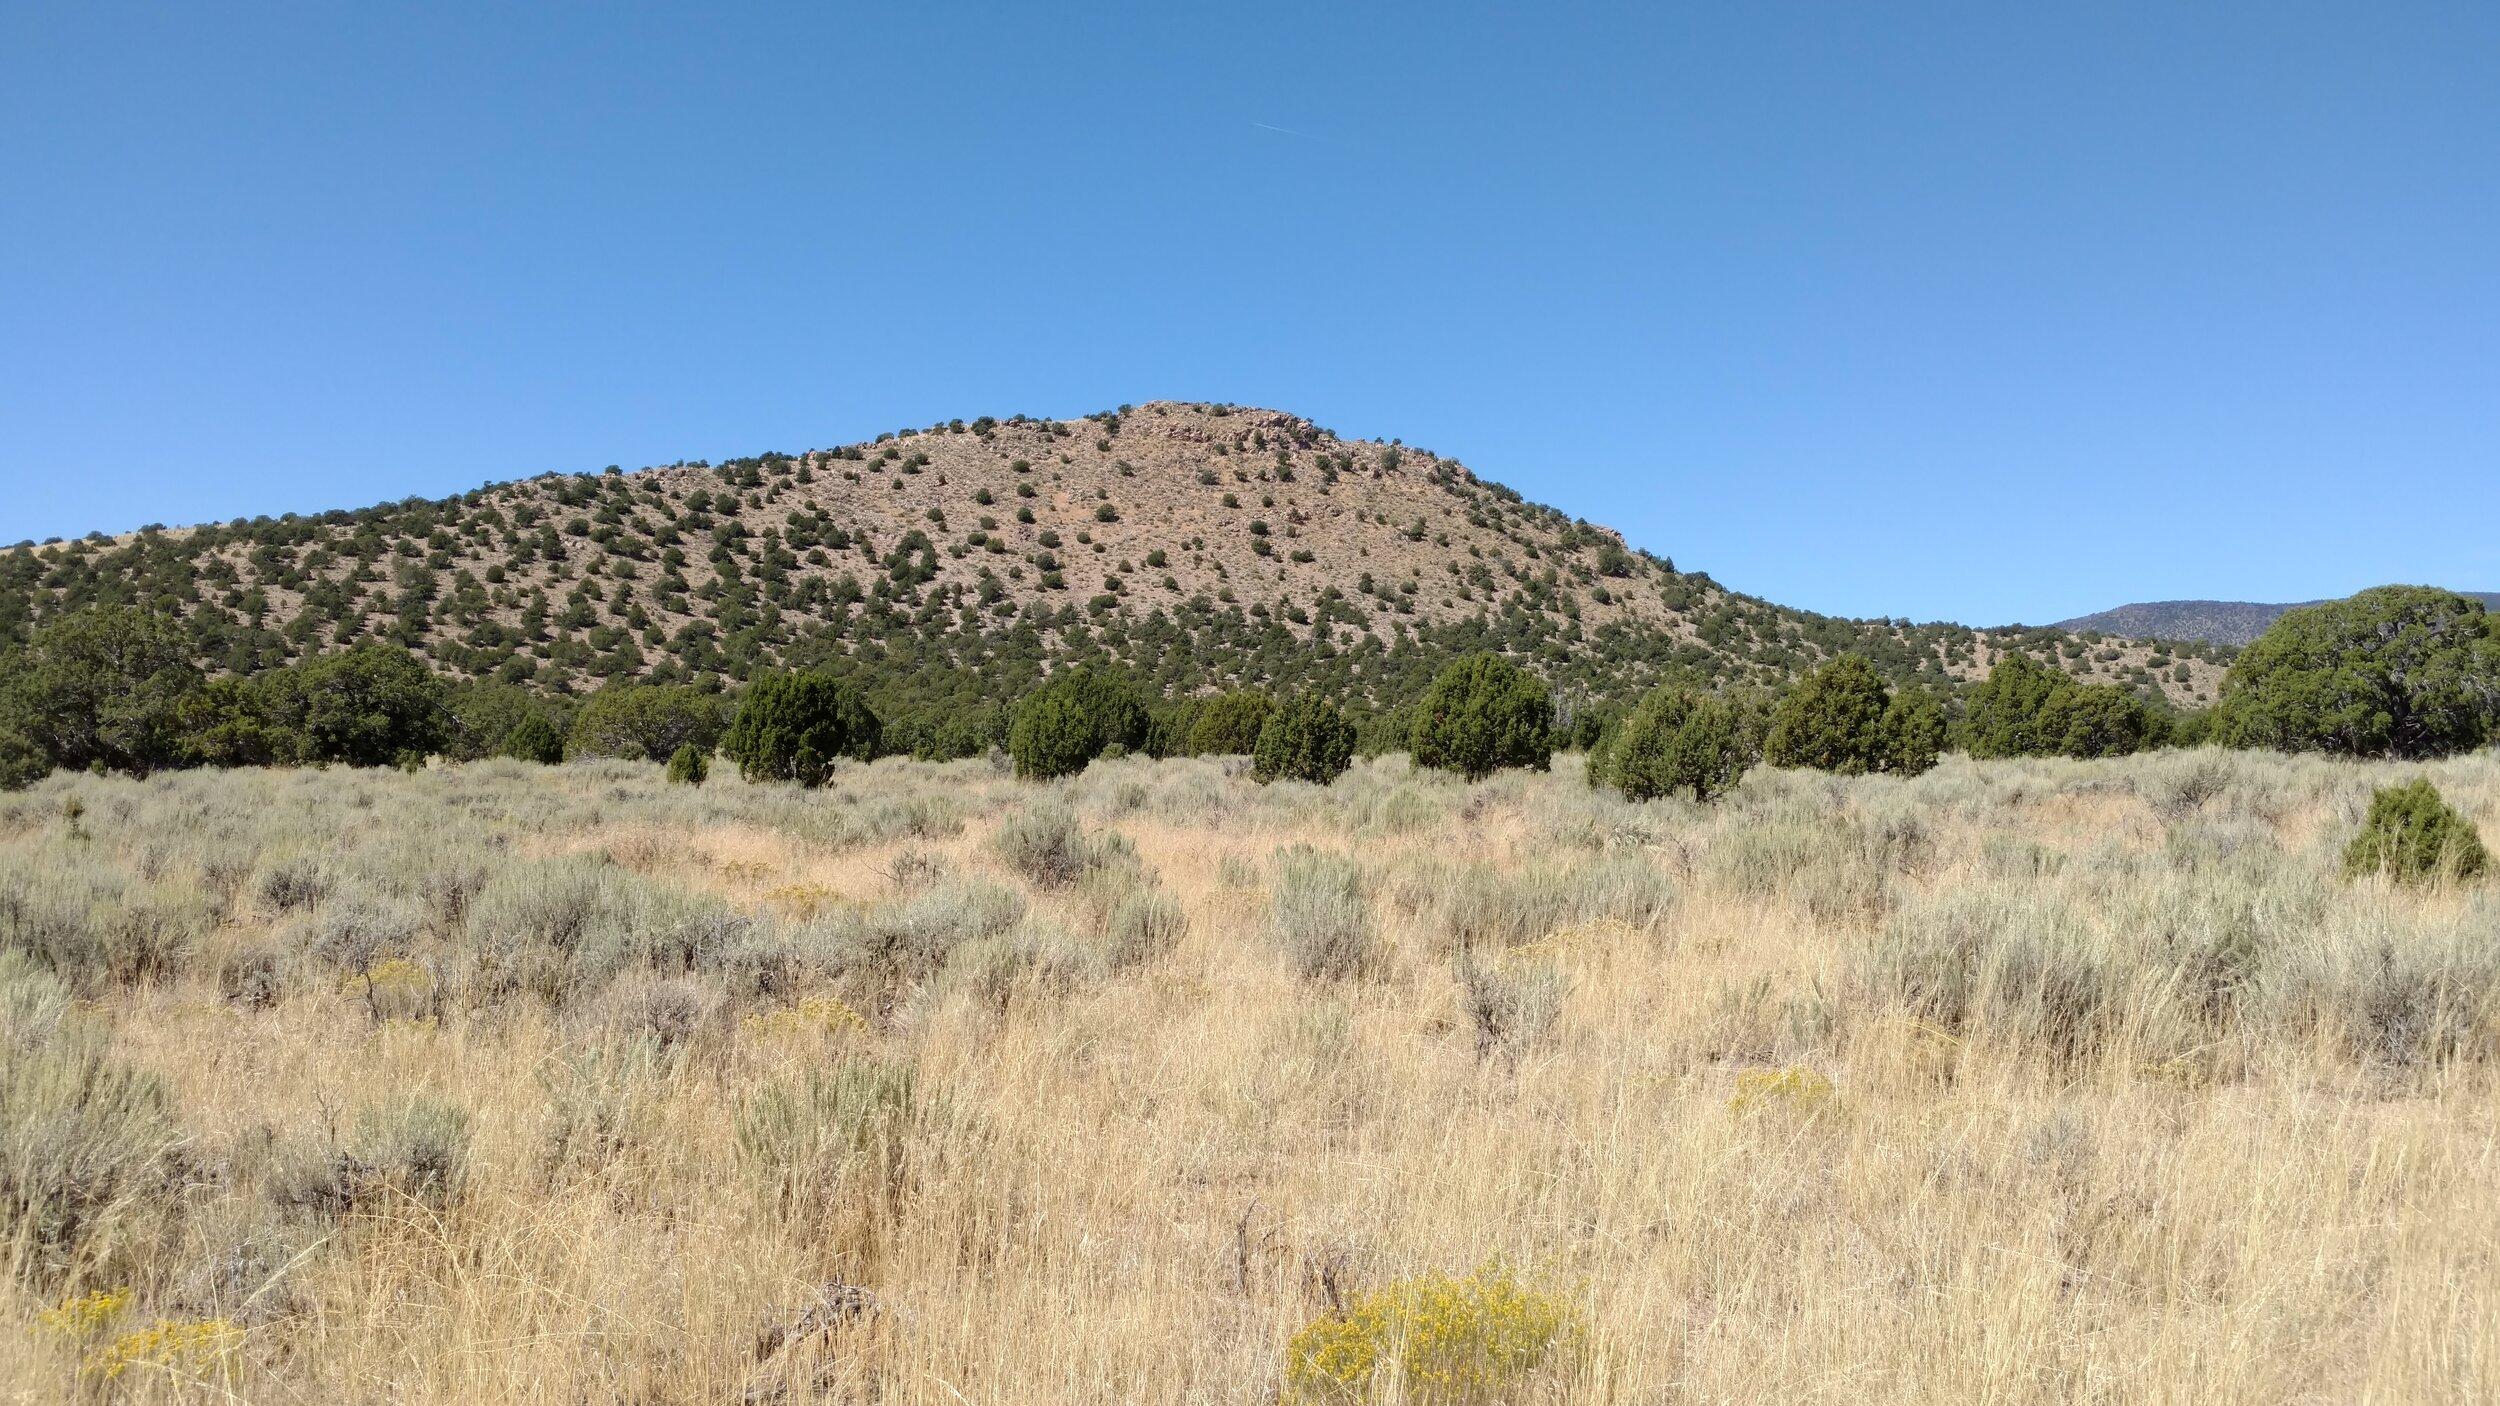 Unnamed Peak 6139, Beaver County, Blue Mountain quadrangle, rise 349, UT Rank 3386